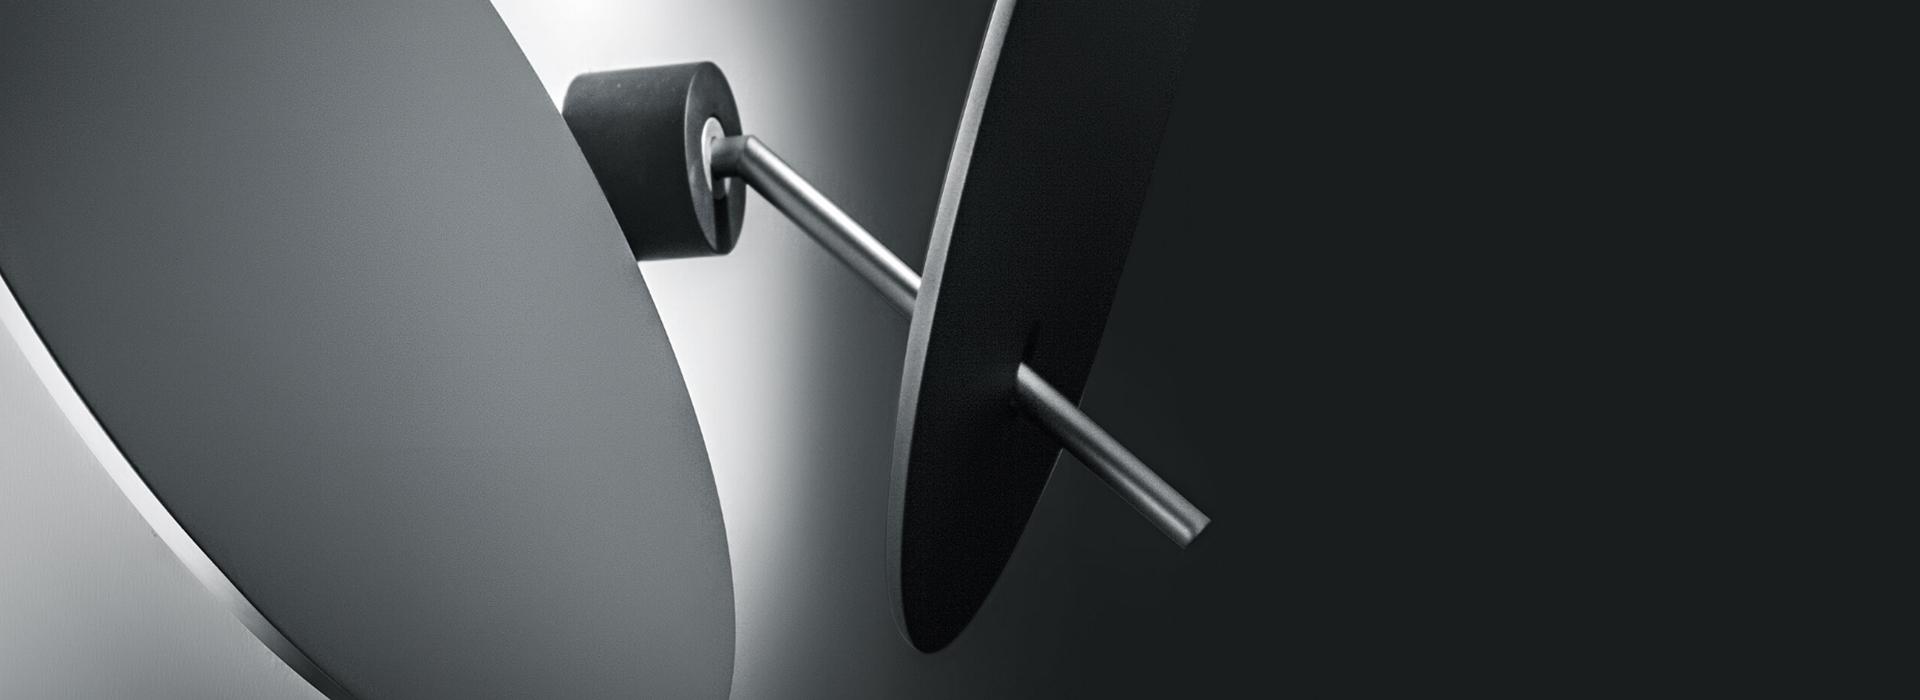 Icone Luce - Zaneen: distributor for design lighting in North America